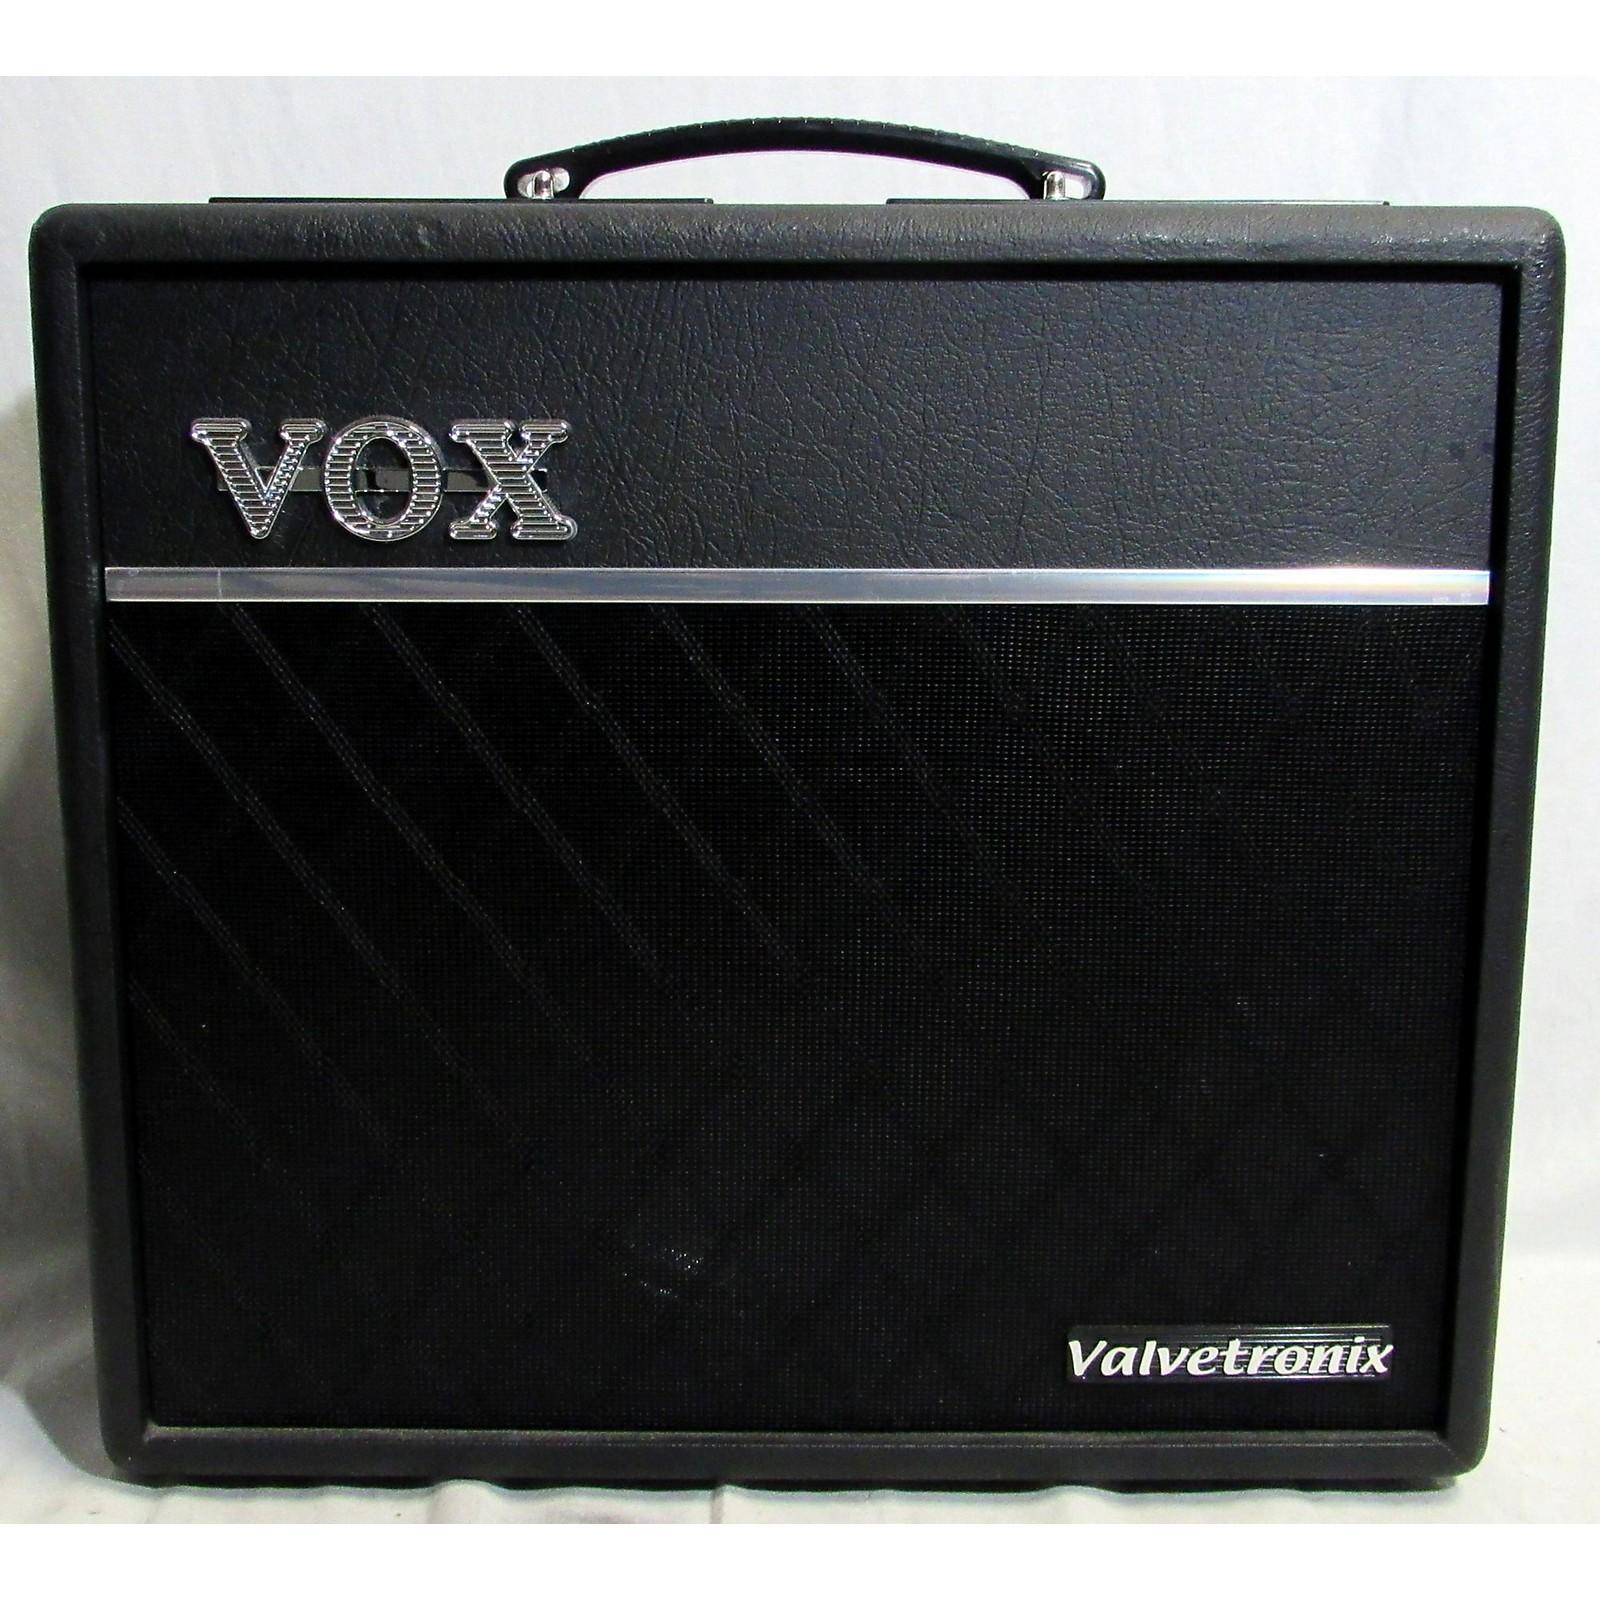 Vox VT40Plus Valvetronix 1x10 40W Guitar Combo Amp